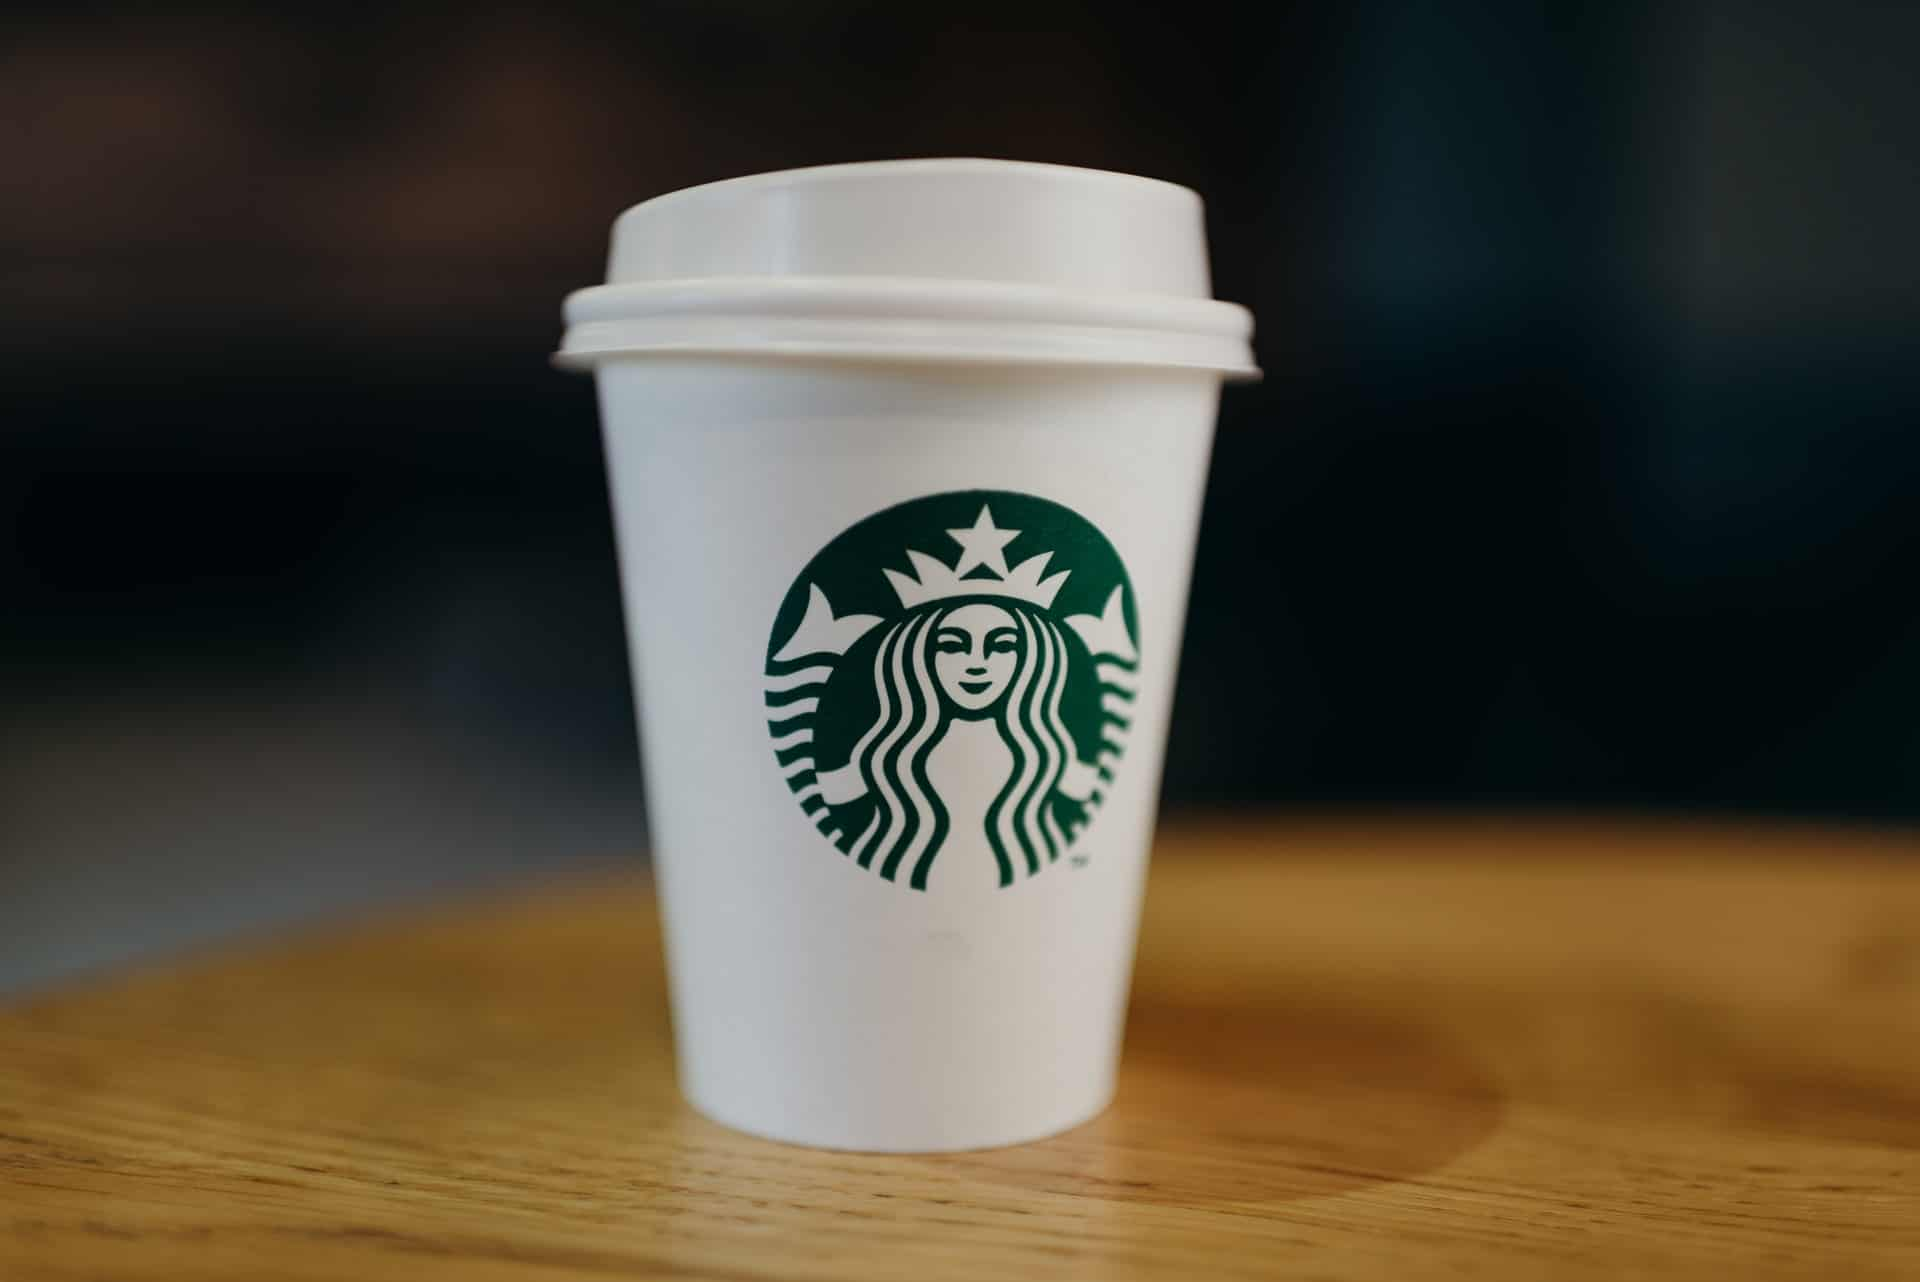 Starbucks logo on coffee